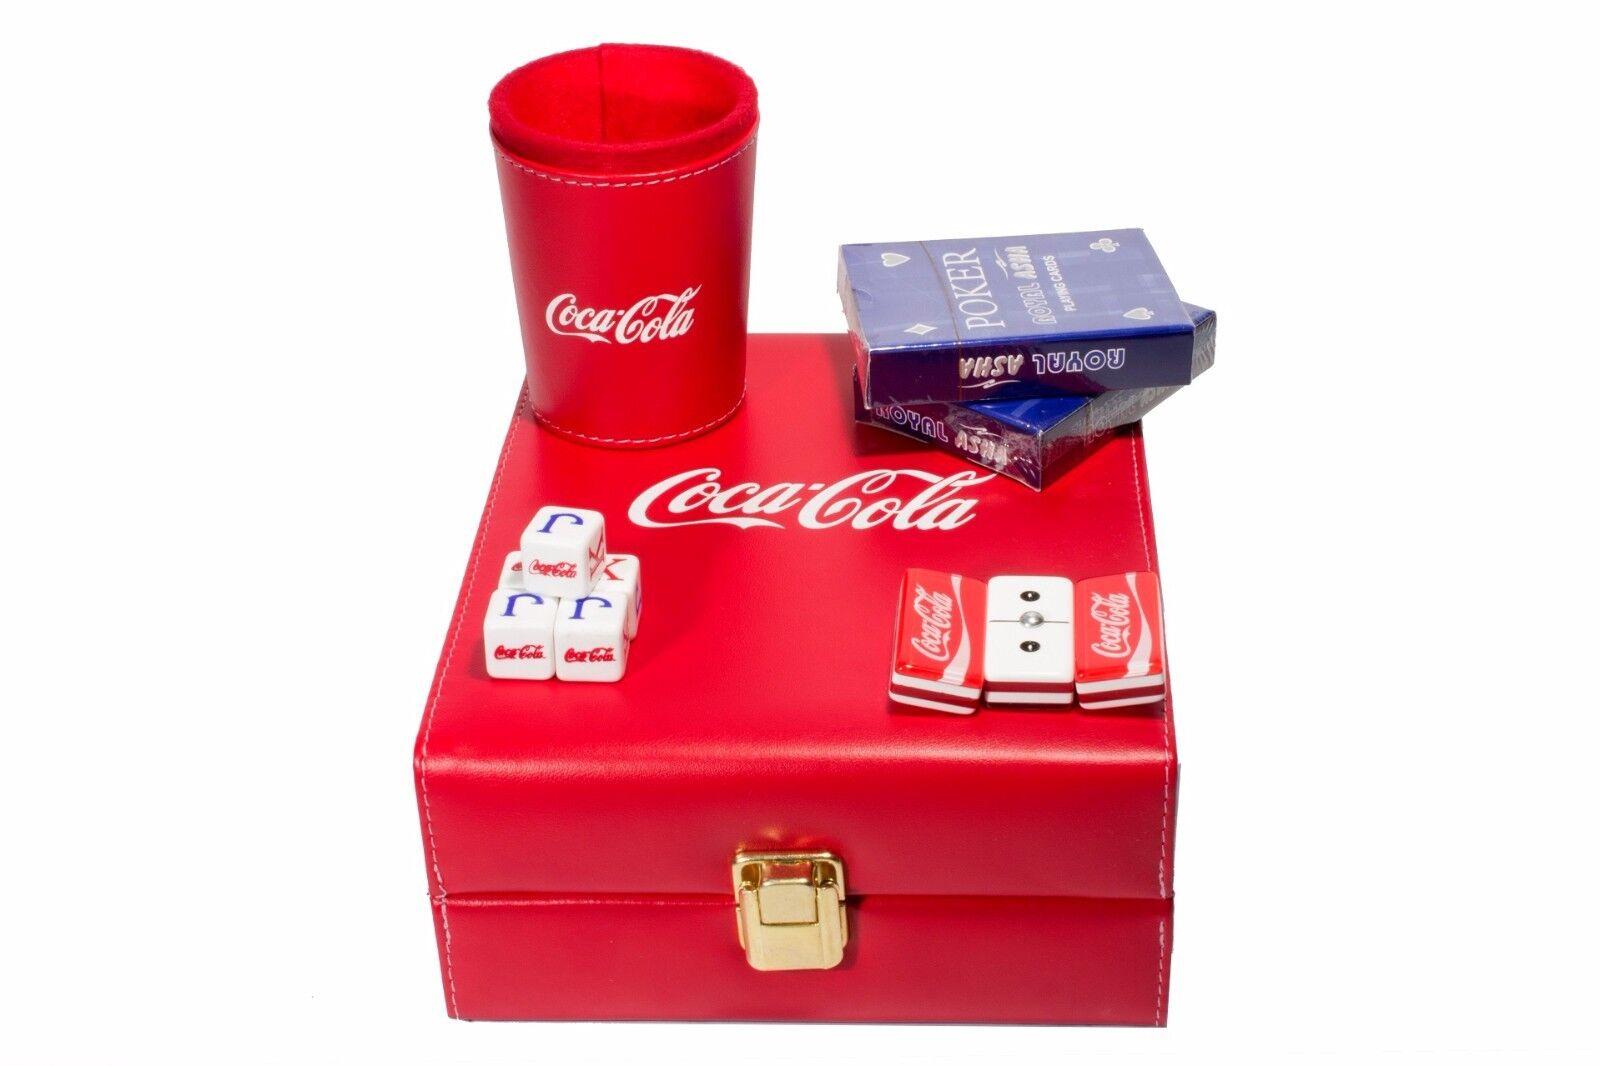 Coca-Cola Deluxe Set 3 Games: Domino, Dice Cup, 2 Poker Cards